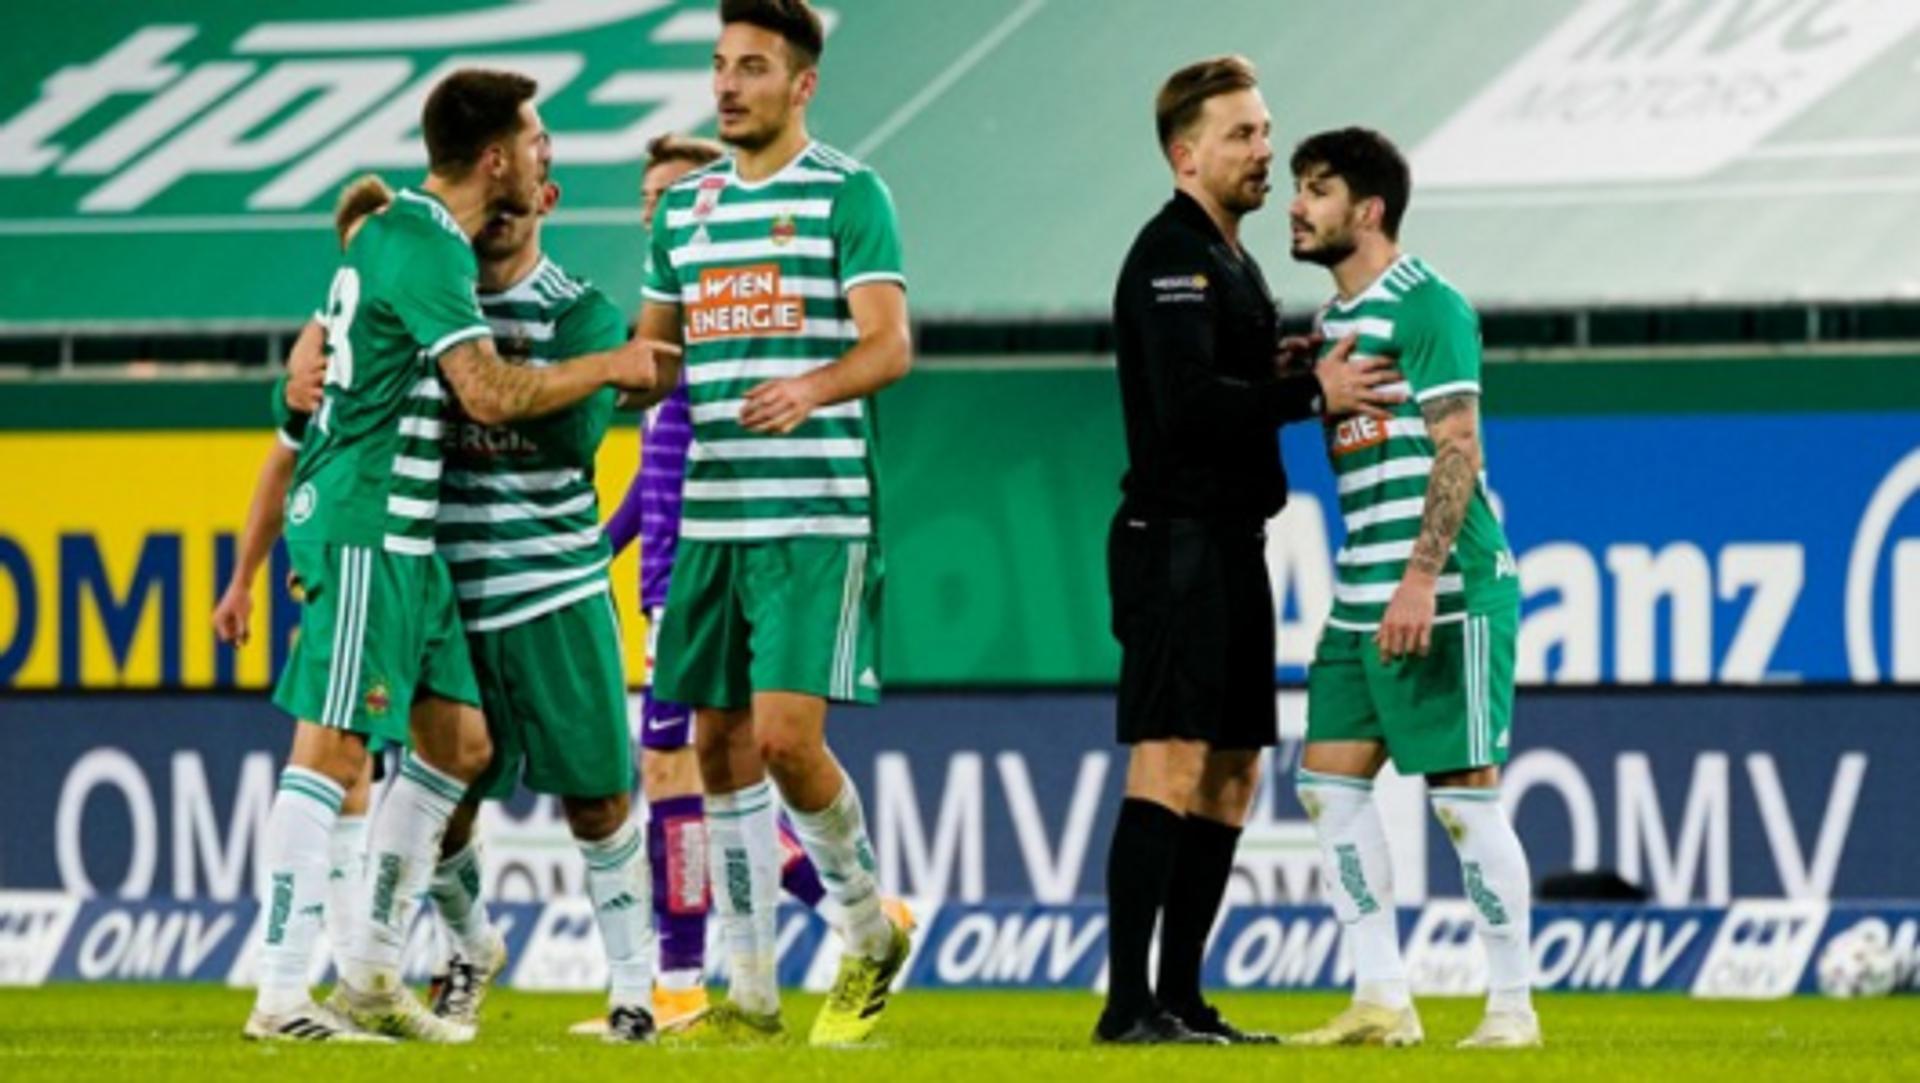 Derby-Frust beim SK Rapid: Thorsten Schick (links)